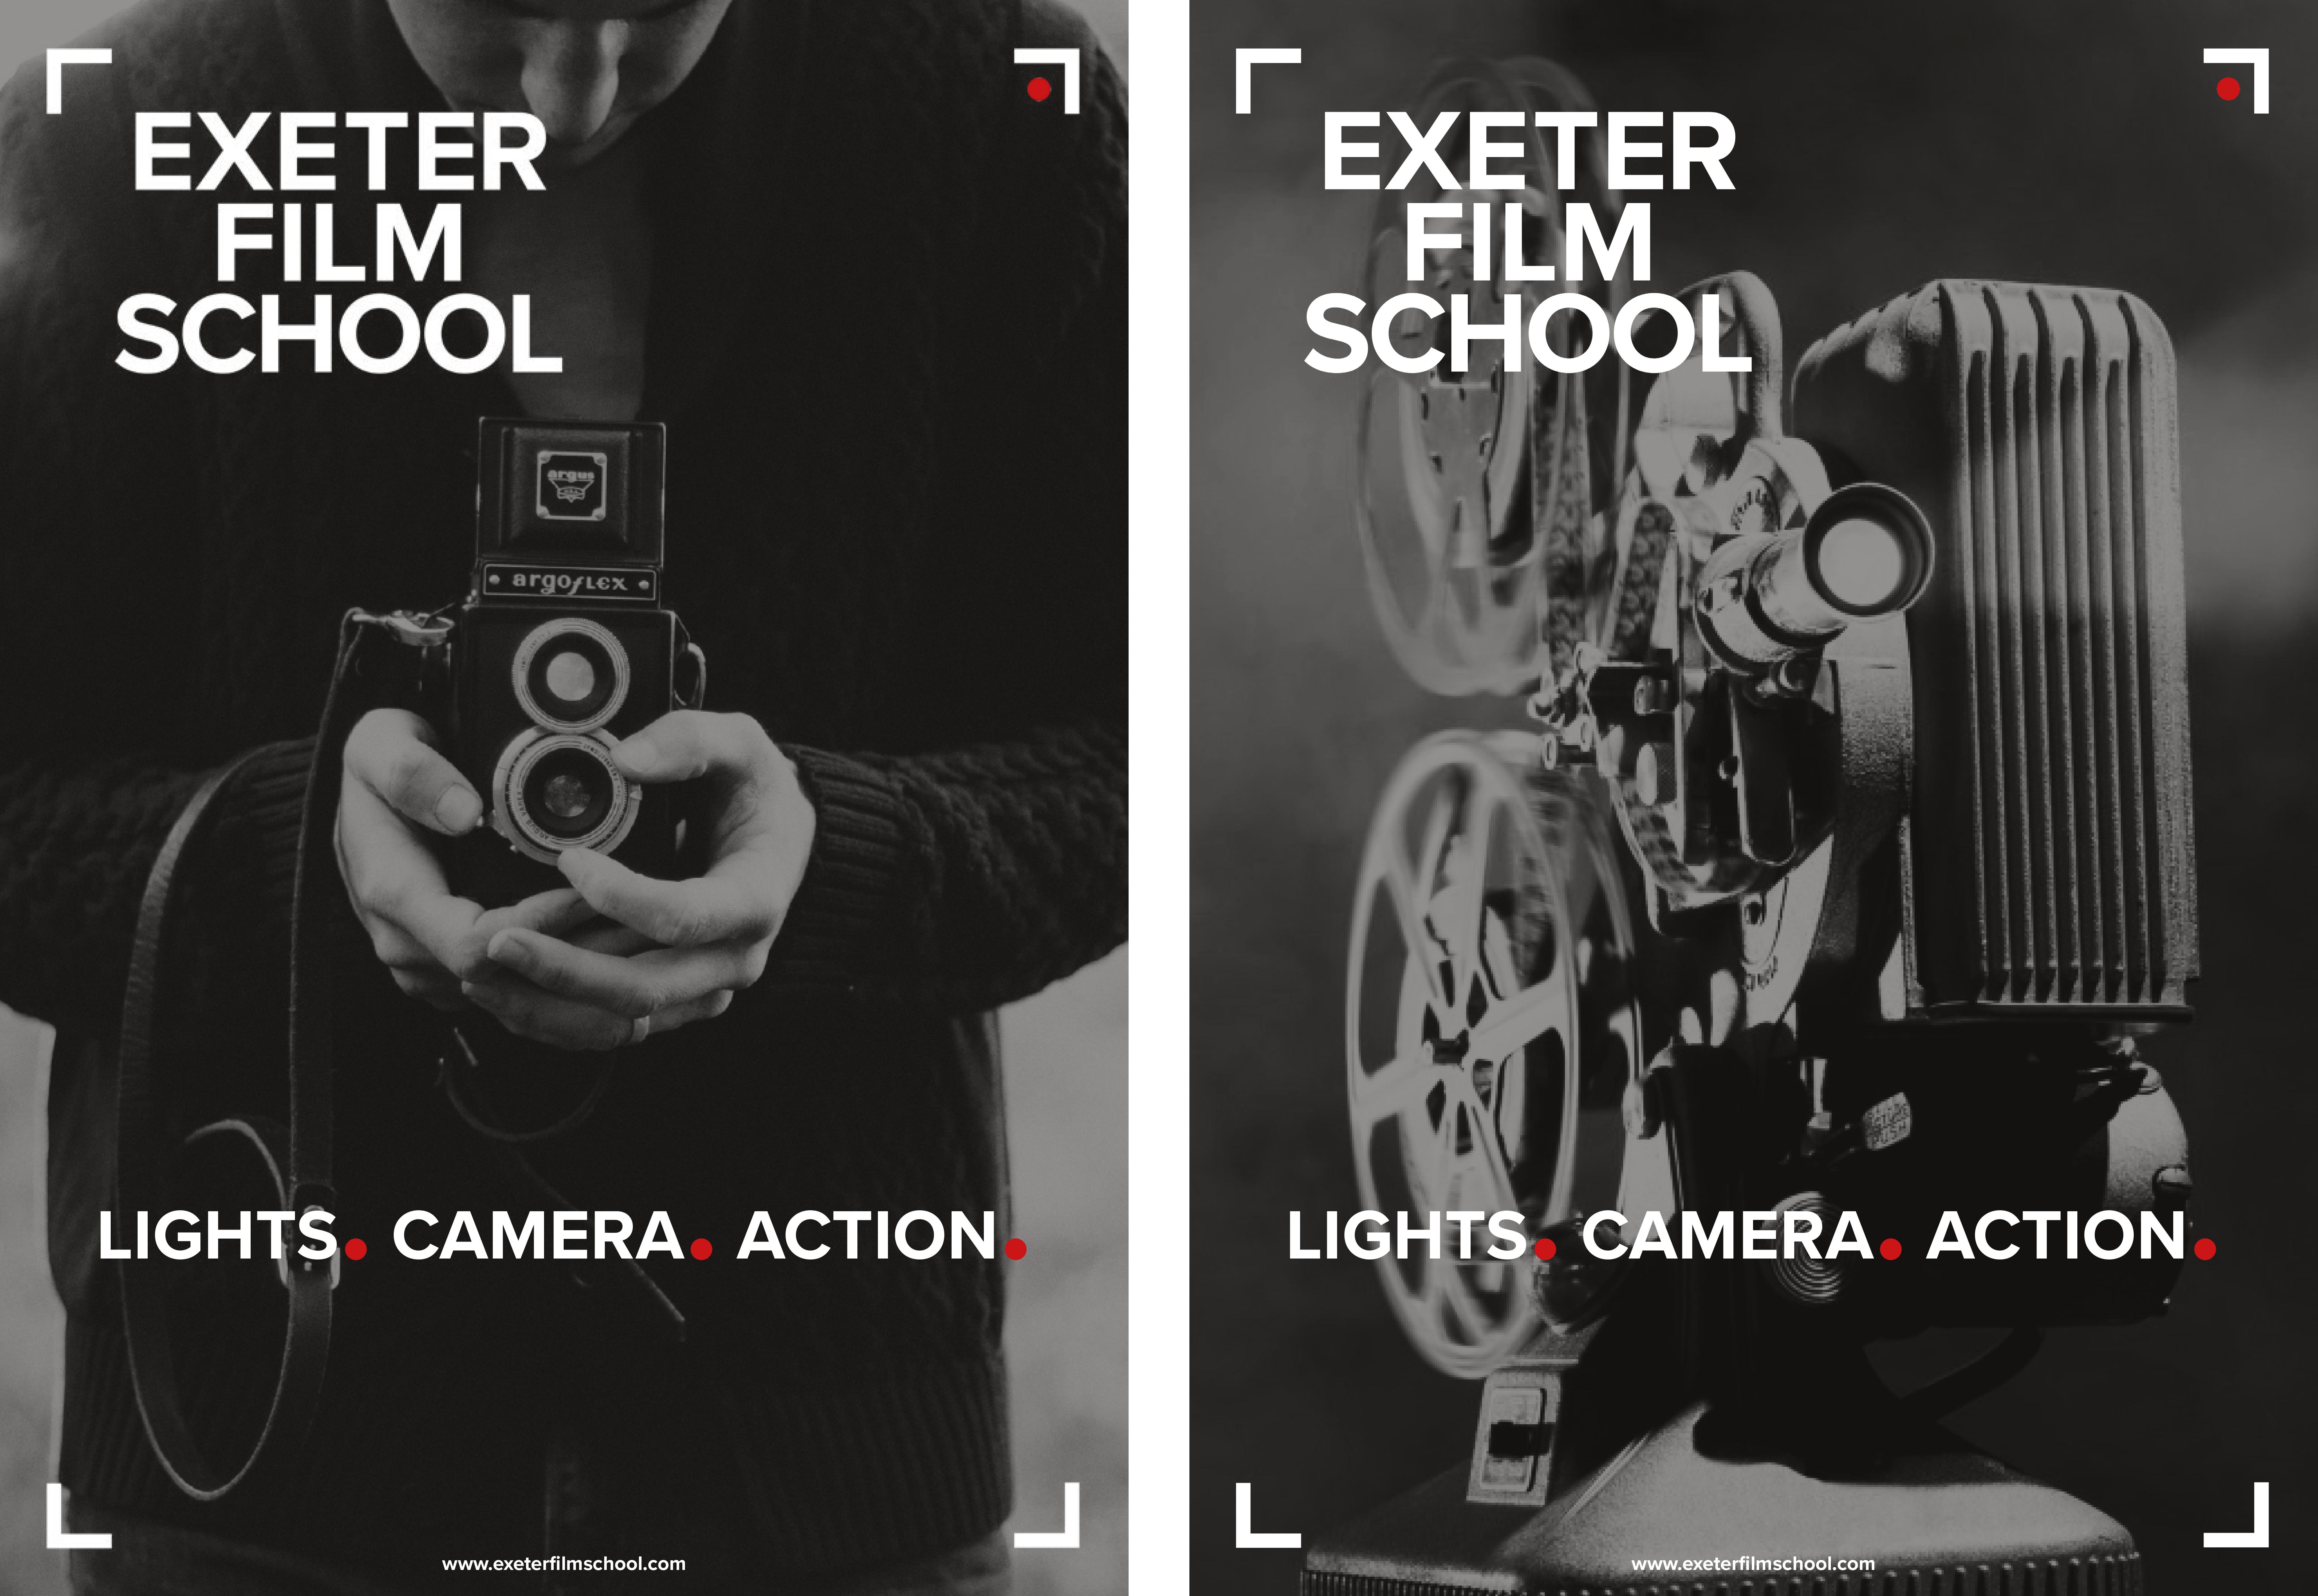 exeter film school poster